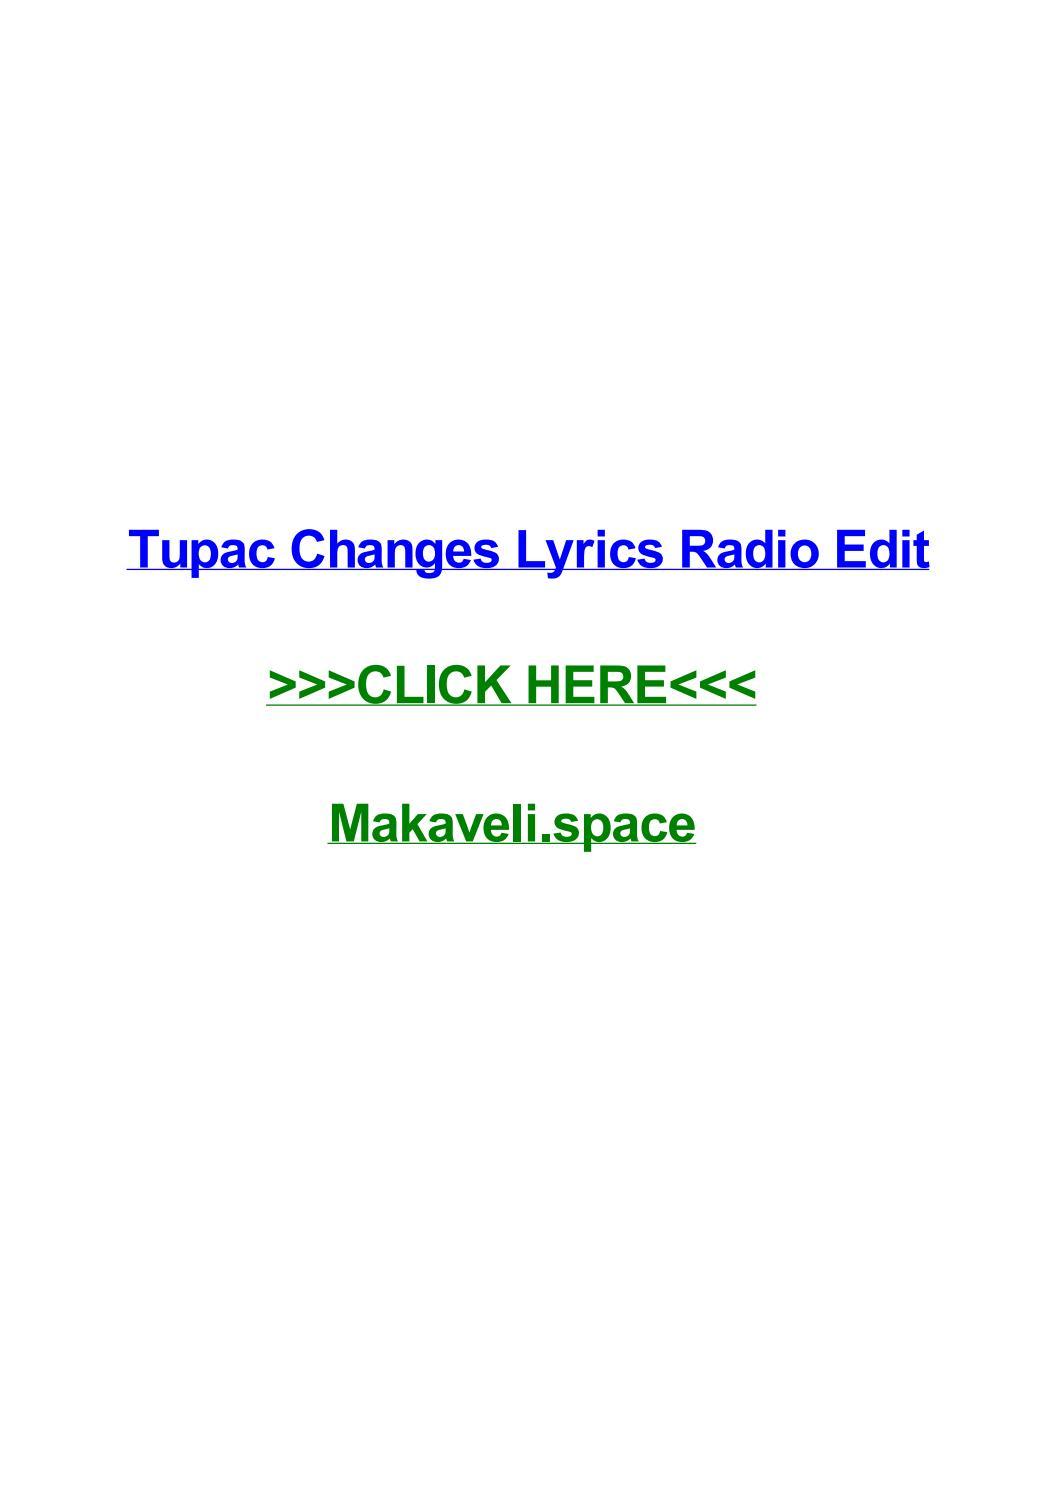 Tupac Changes Lyrics Radio Edit By Eddieycmj Issuu